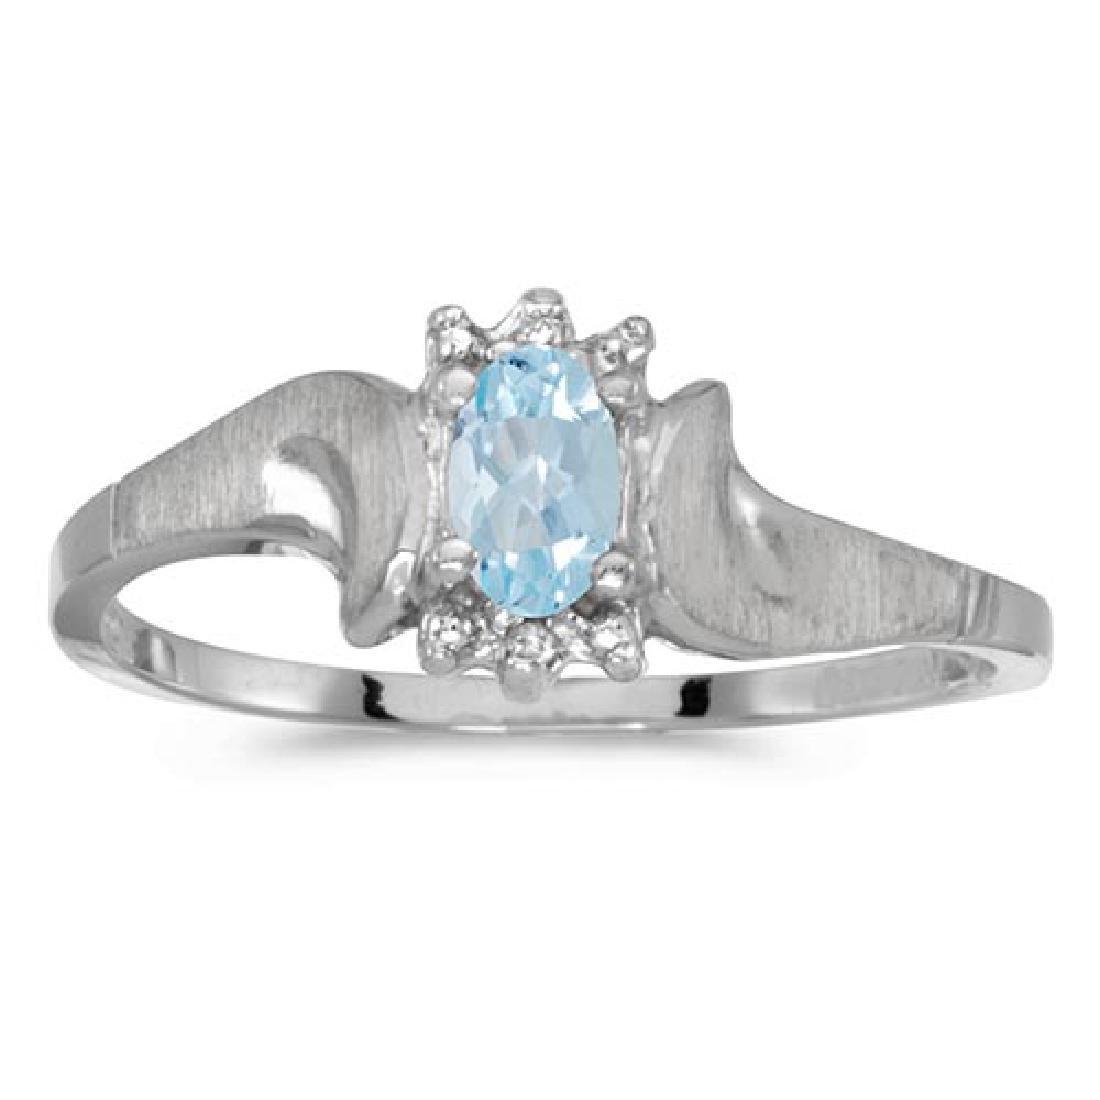 Certified 14k White Gold Oval Aquamarine And Diamond Sa